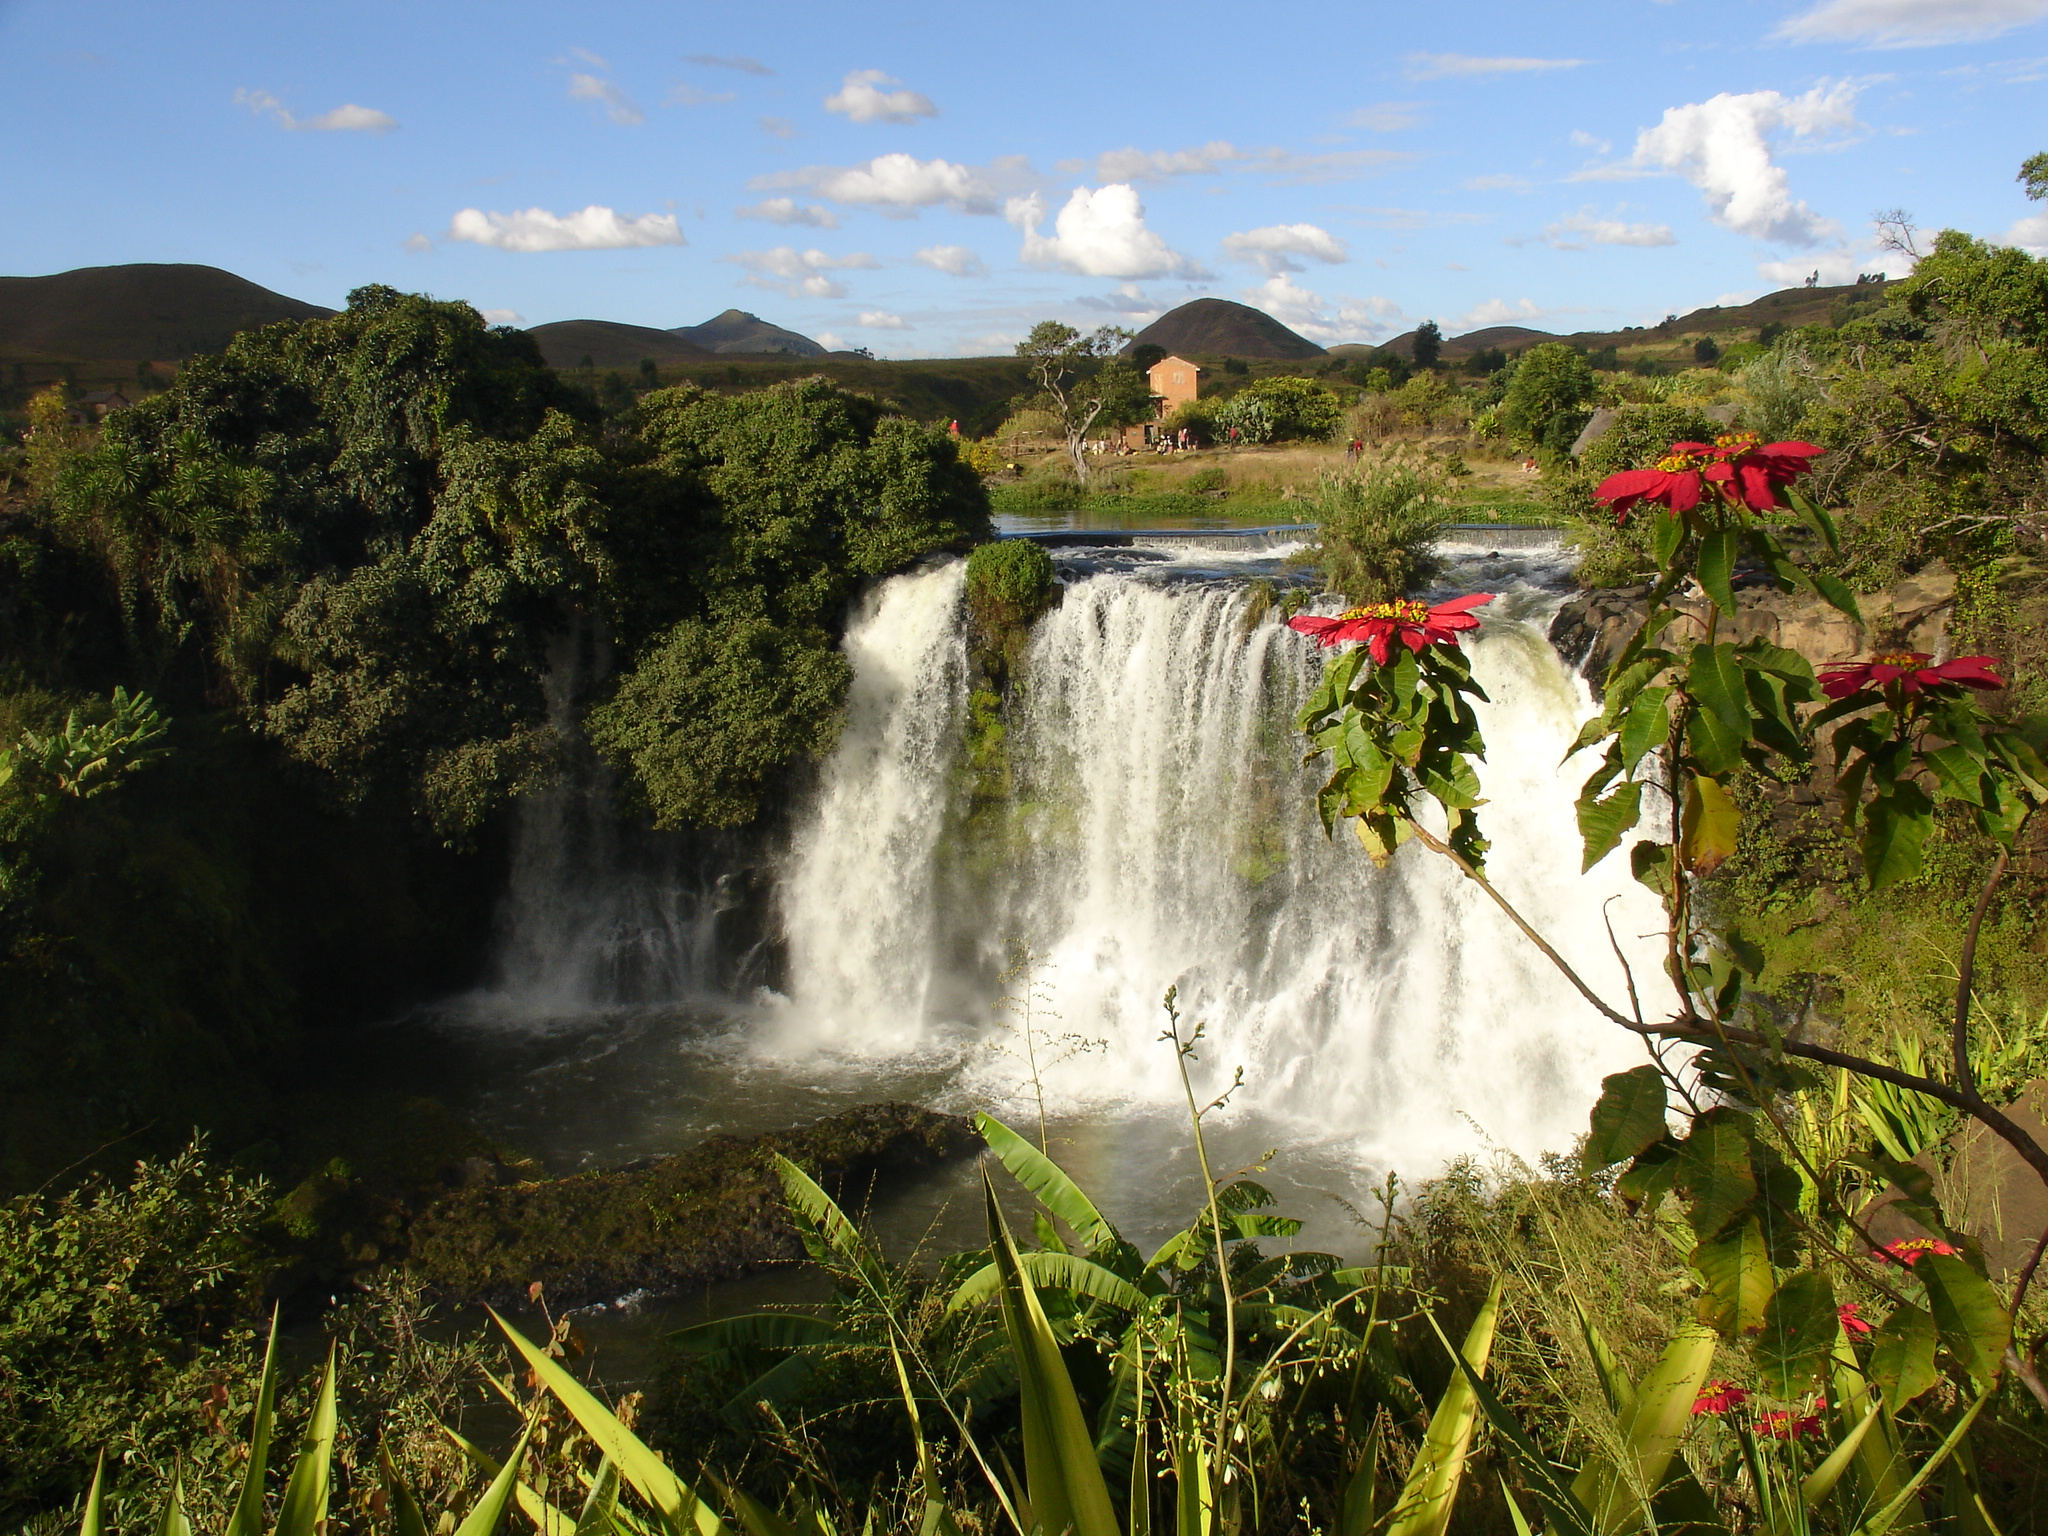 Lilly De La Chute Waterfall Madagascar